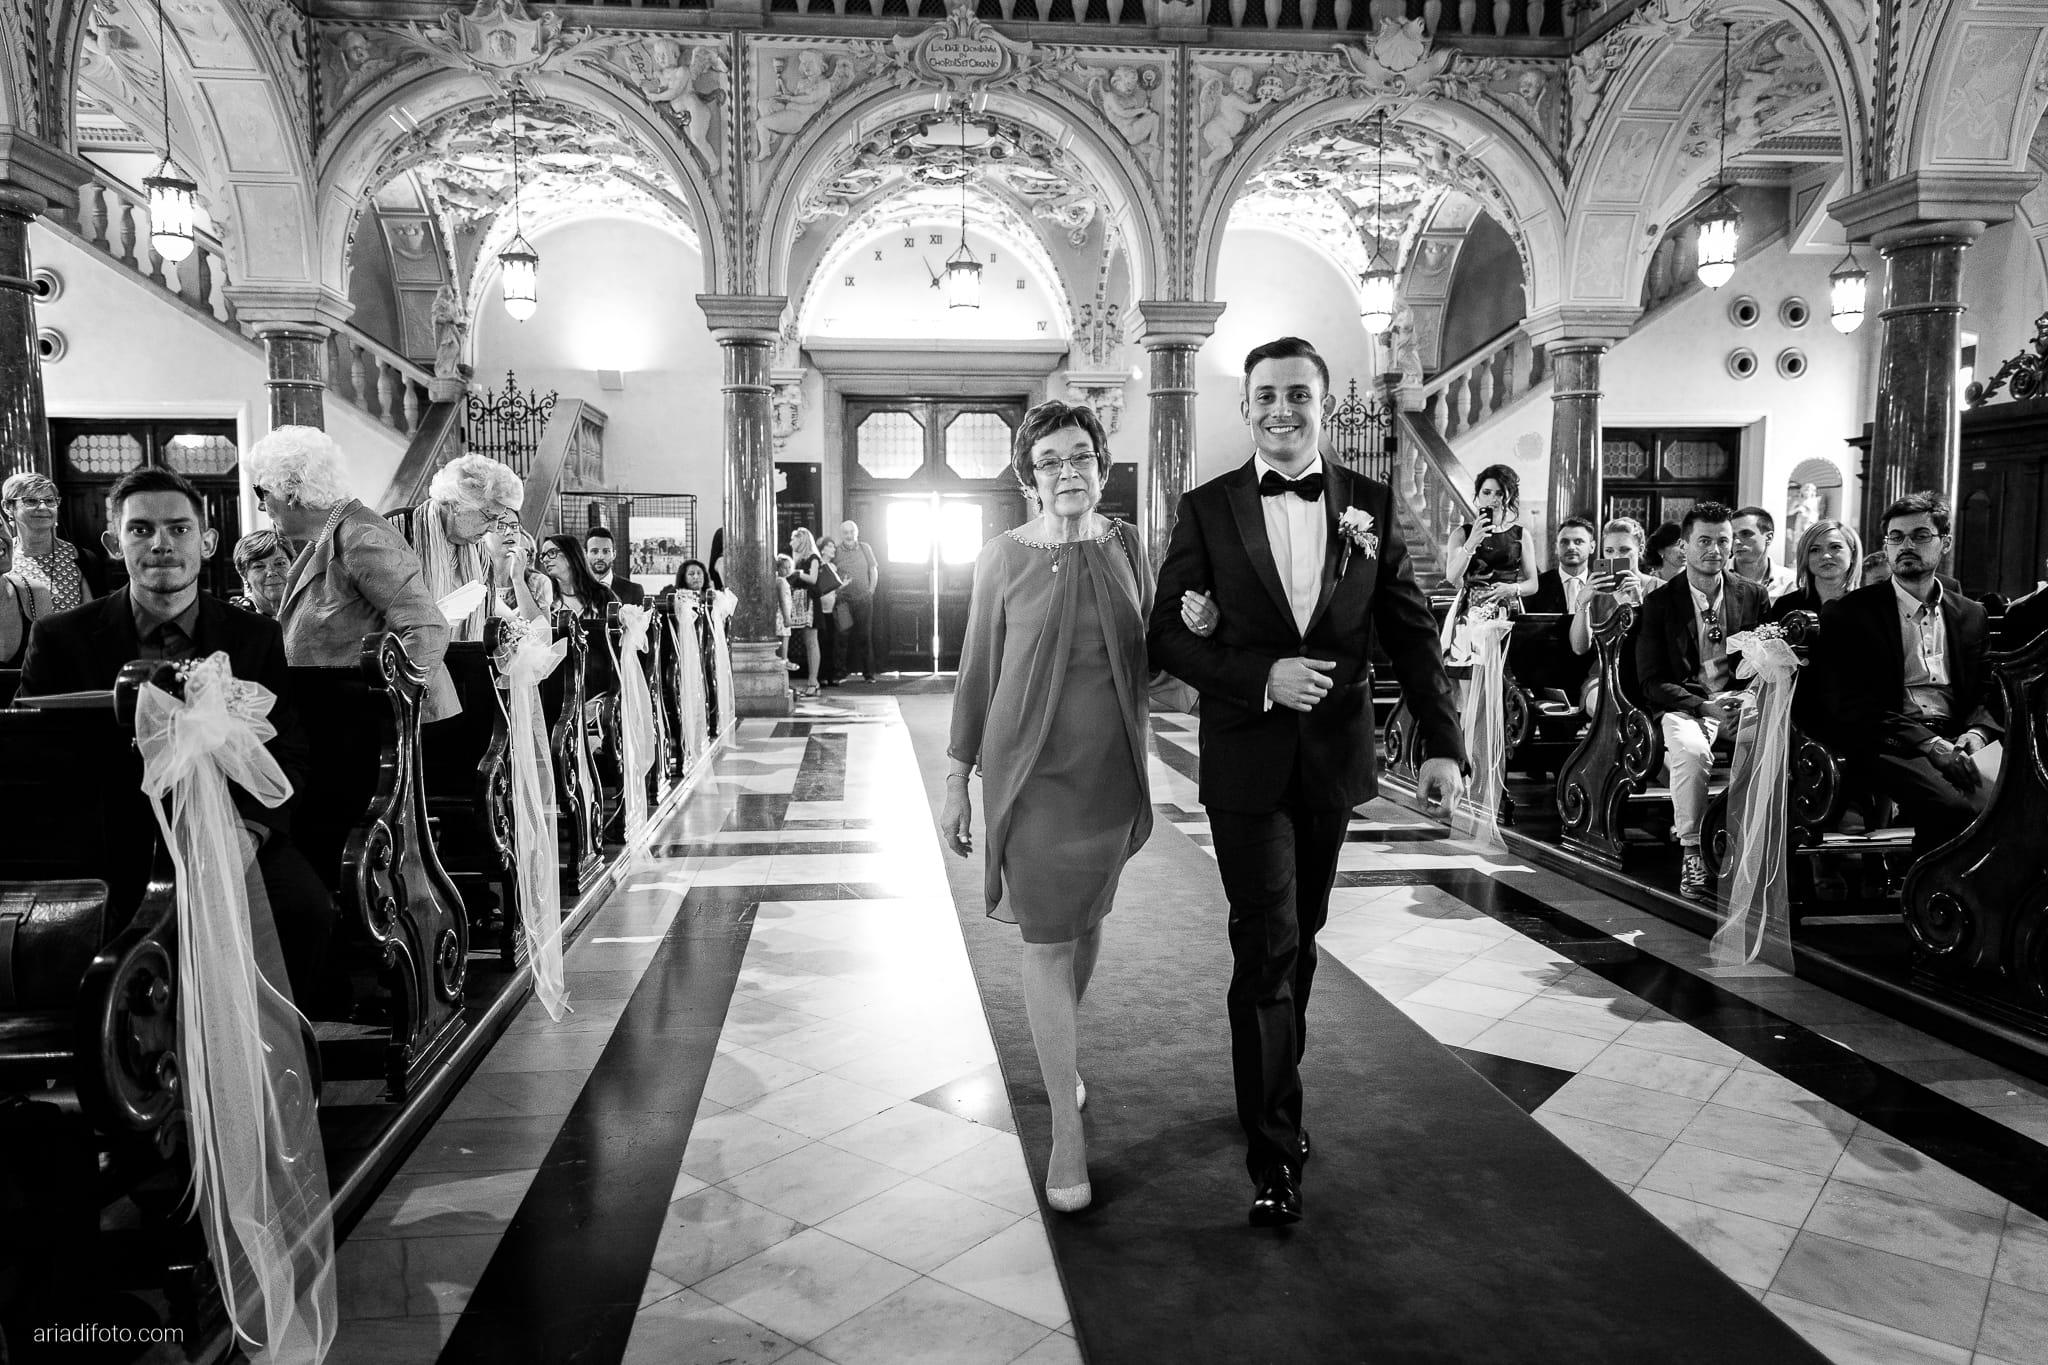 Valentina Marco Matrimonio Duomo Gorizia Castelvecchio Sagrado cerimonia cattolica ingresso sposo